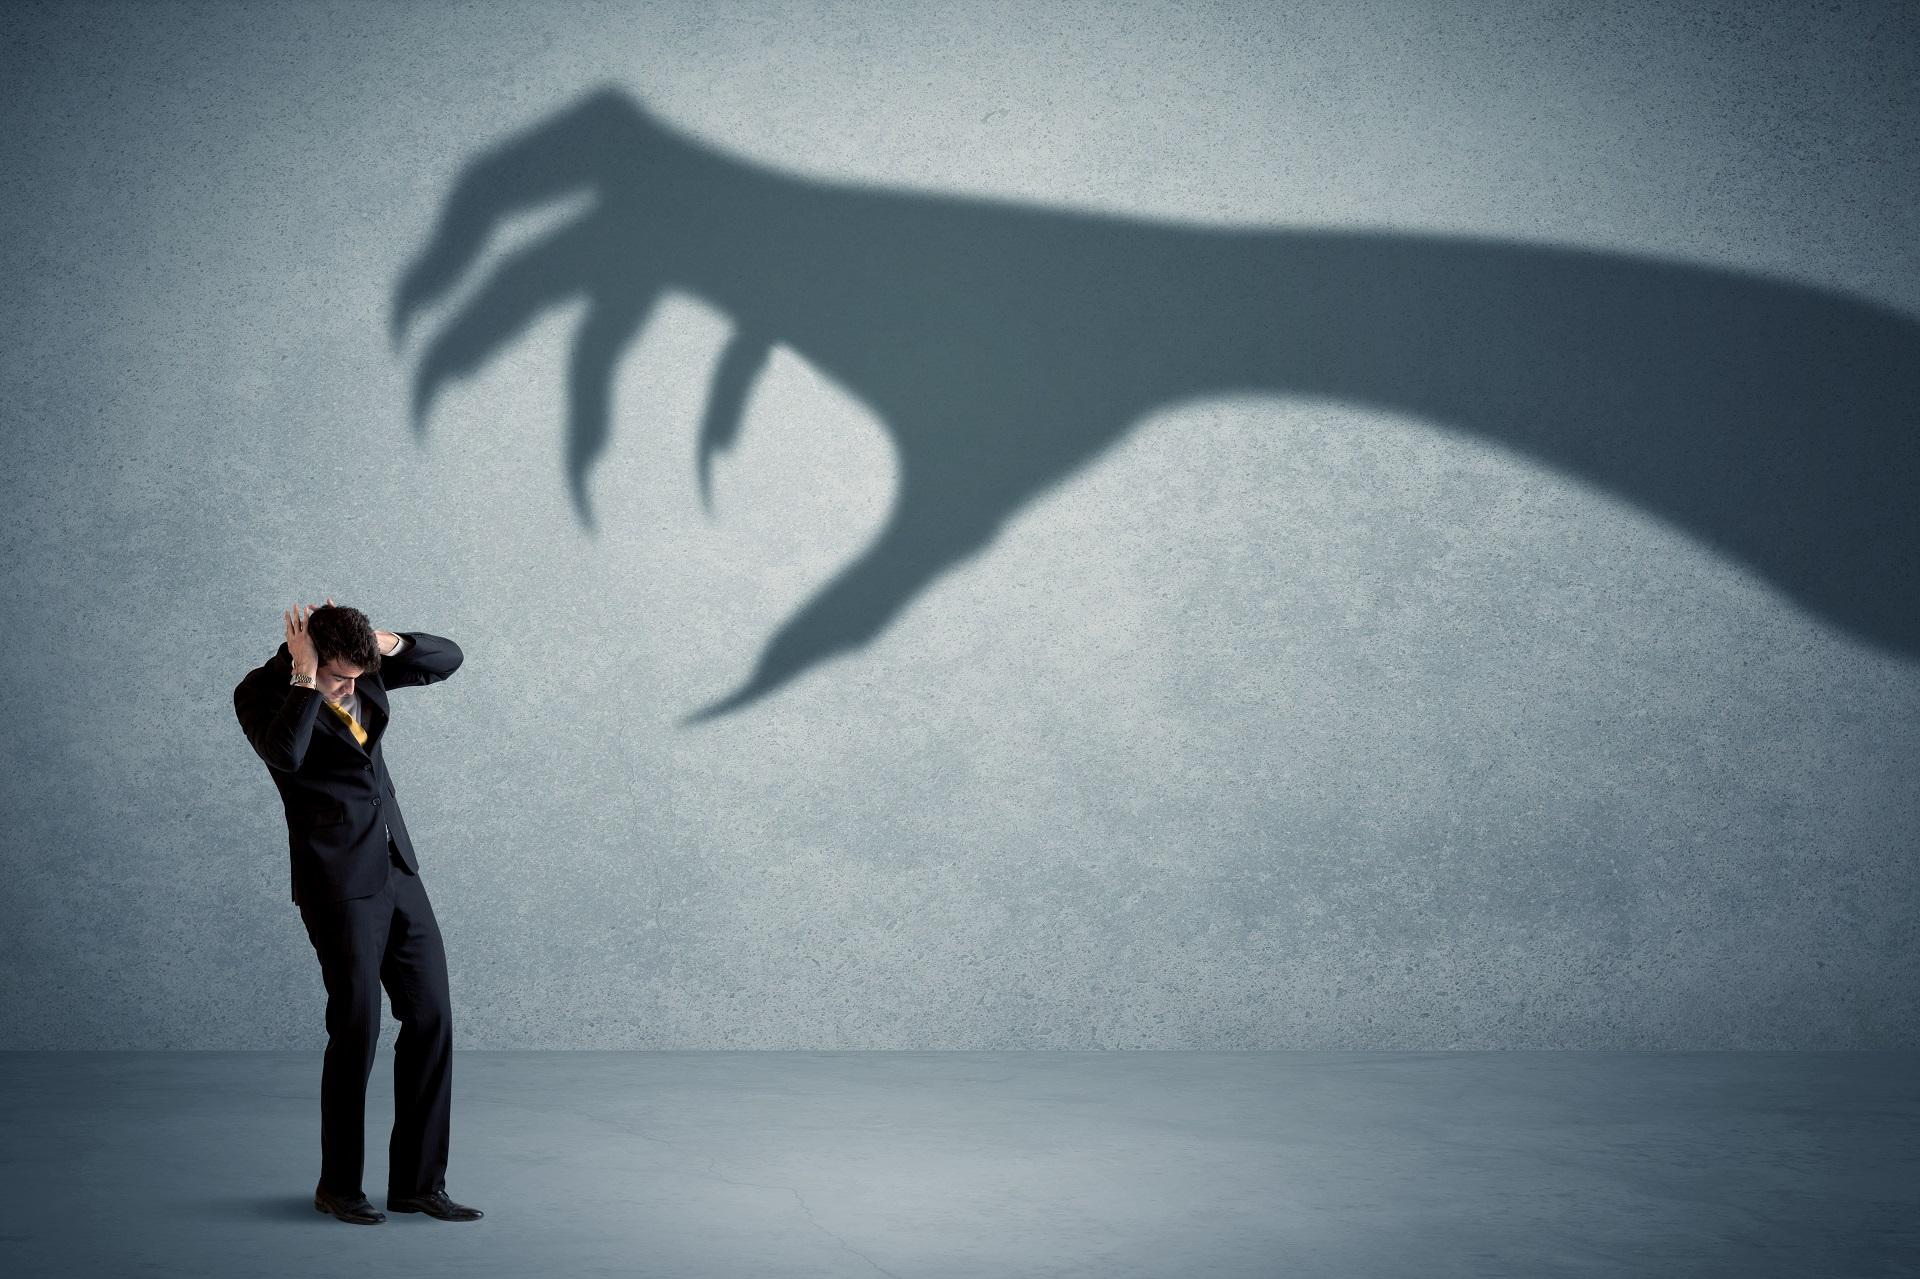 symbollic representation of scared entrepeneur